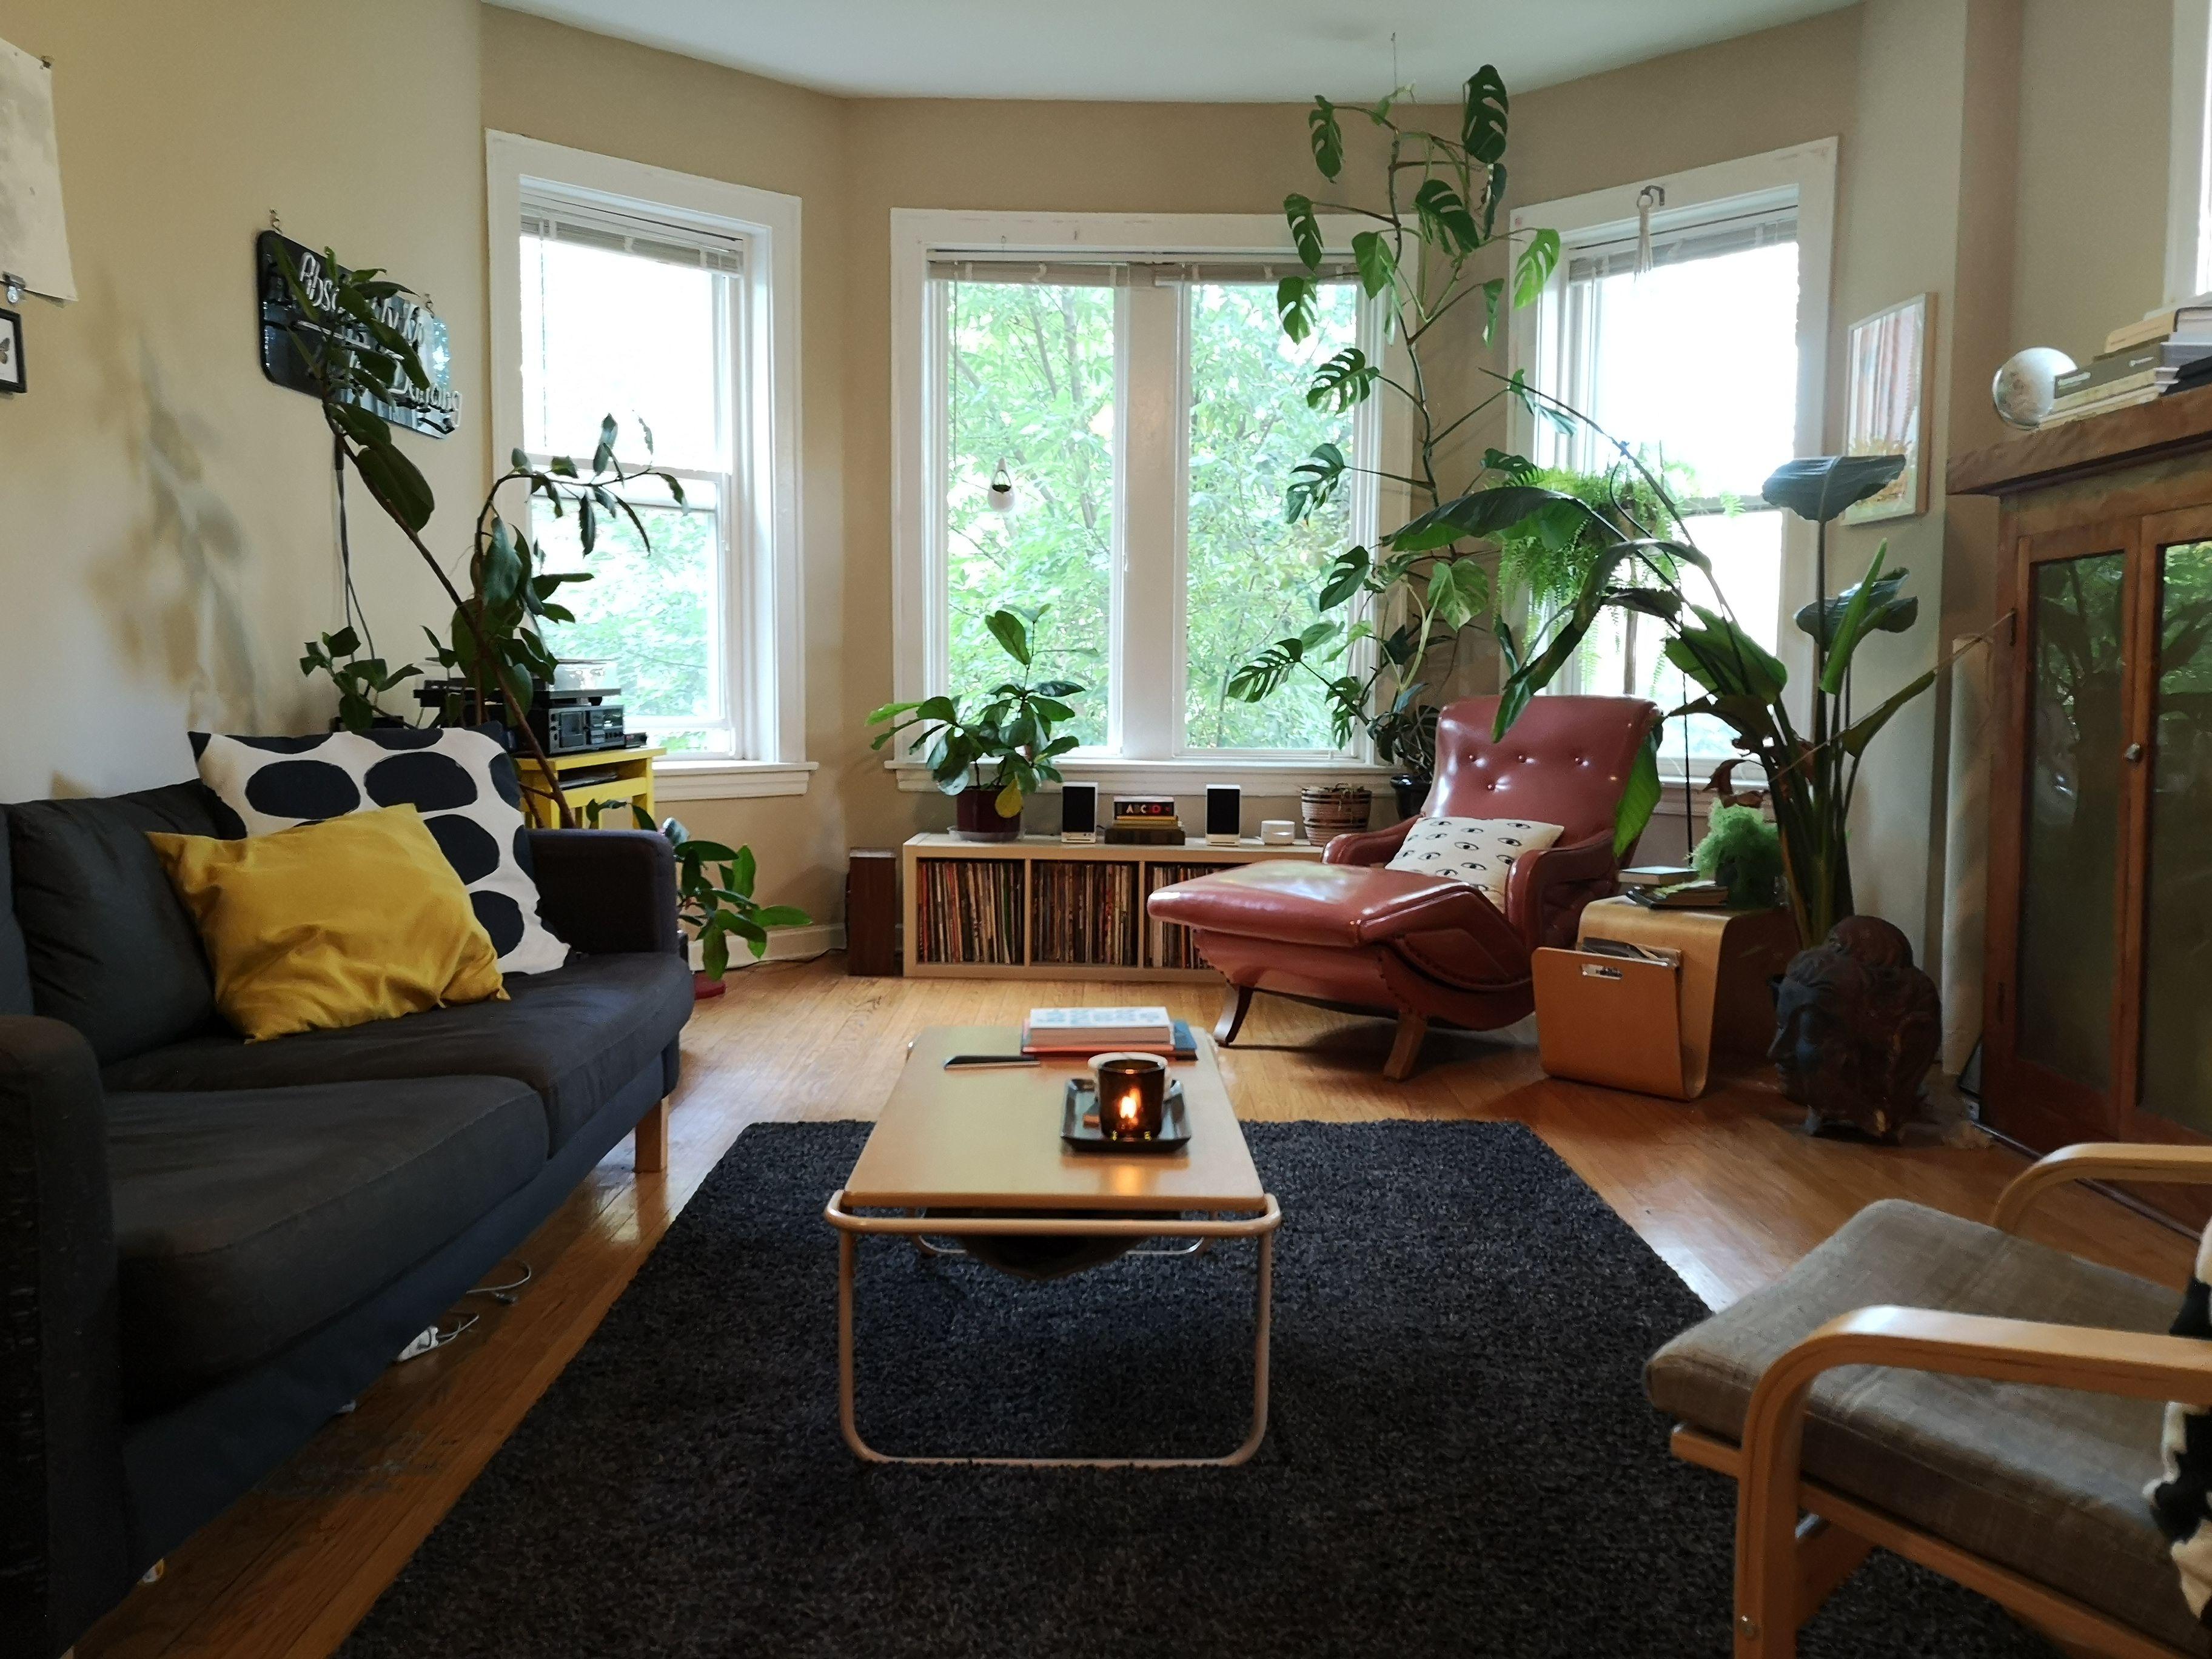 Vintage And Retro Living Room With Bay Windows Crown Molding Hardwood Floors Black Area R Vintage Apartment Decor Vintage Living Room Bay Window Living Room